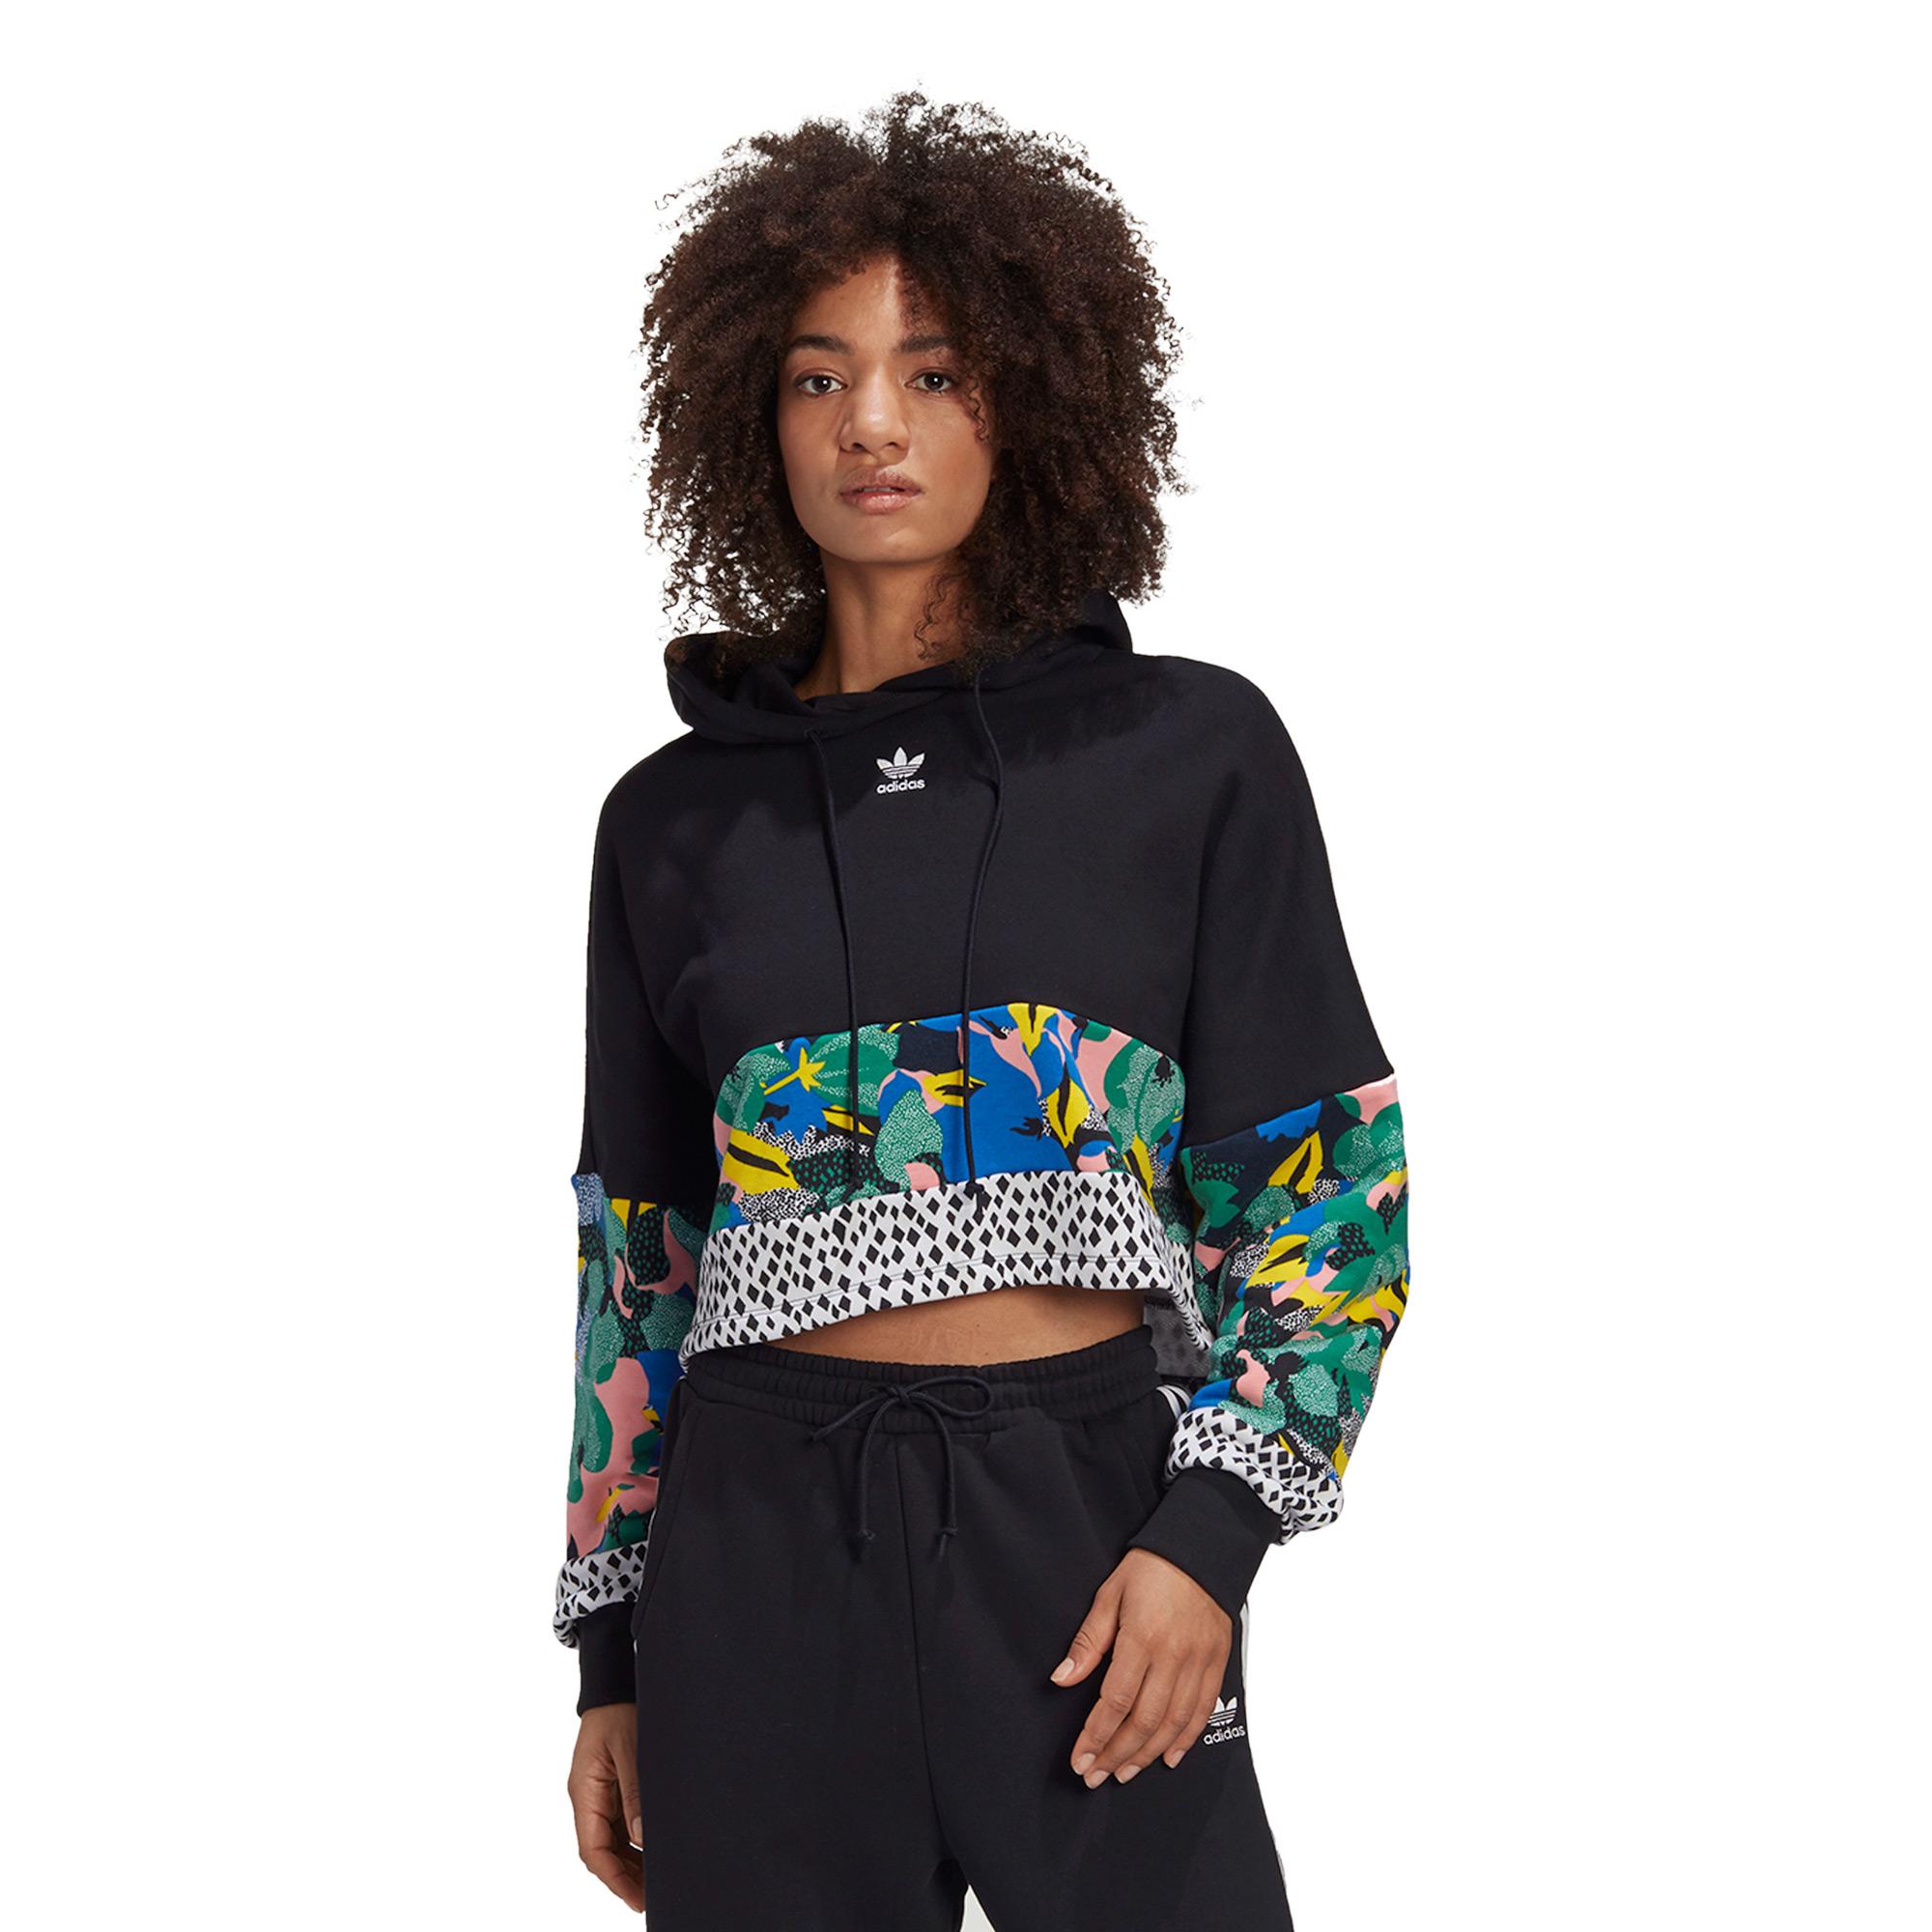 HER Studio London Kapüşonlu Kadın Siyah Sweatshirt